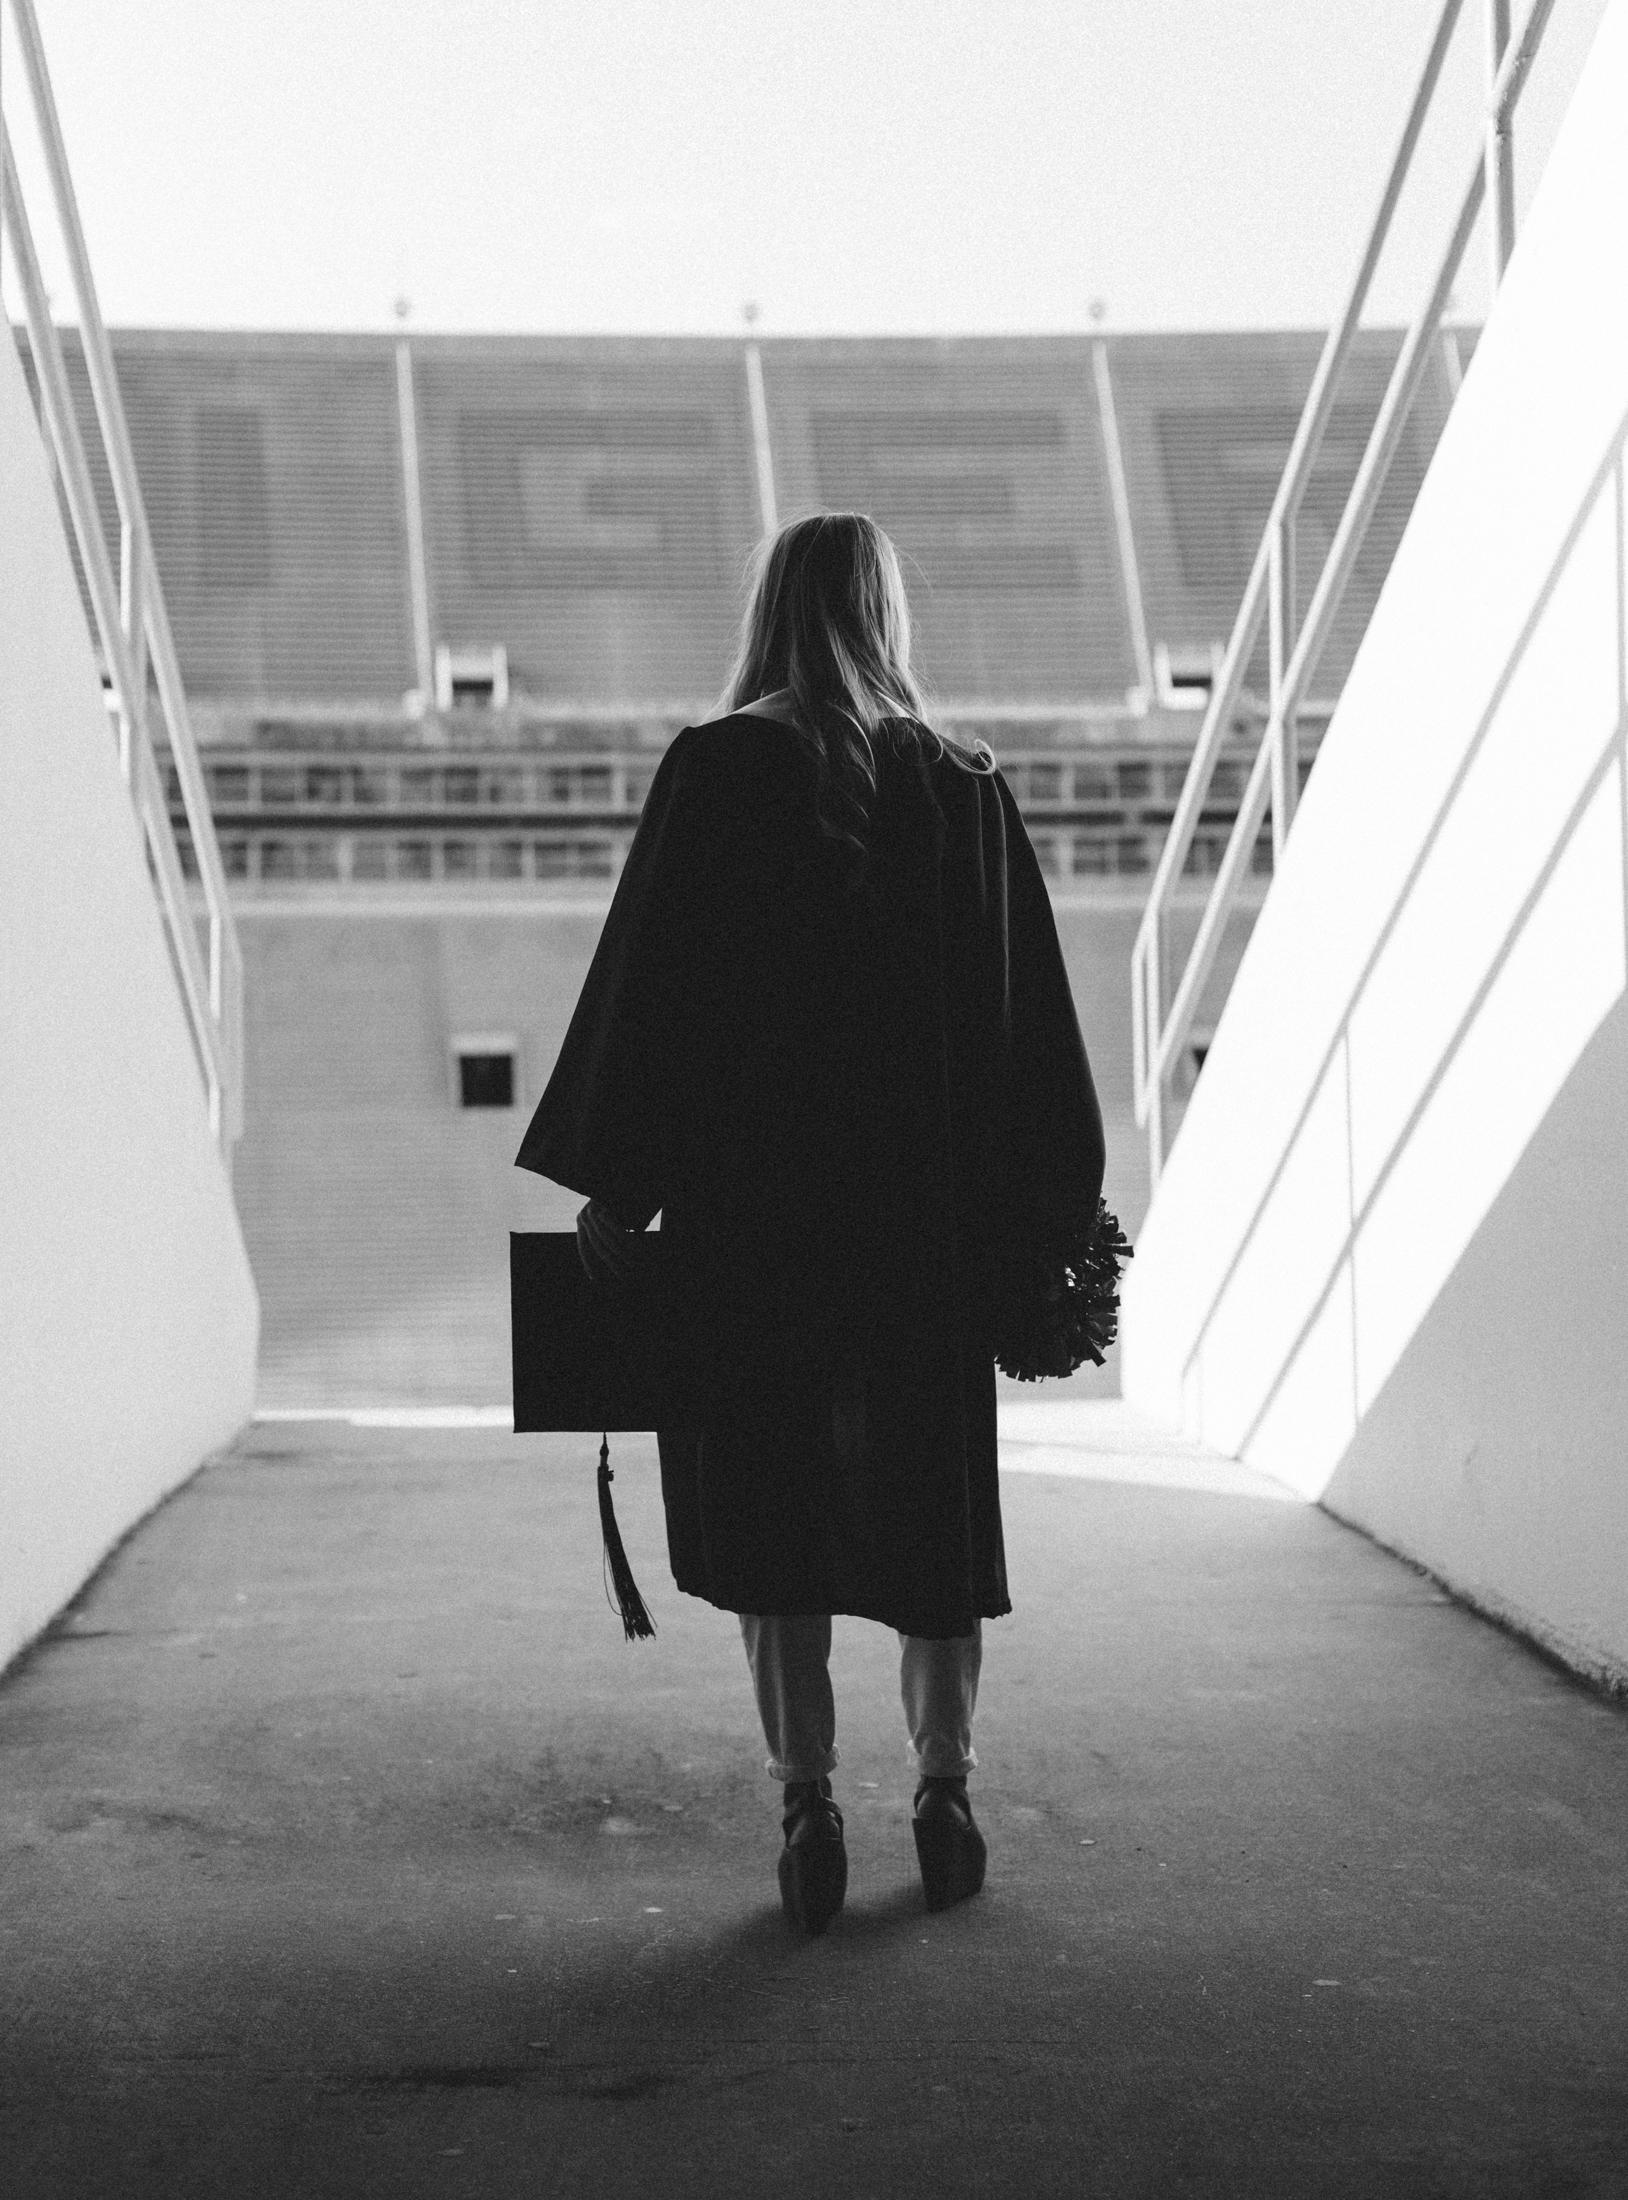 Caroline Potter-Clemson University_DP_2016-7614.jpg